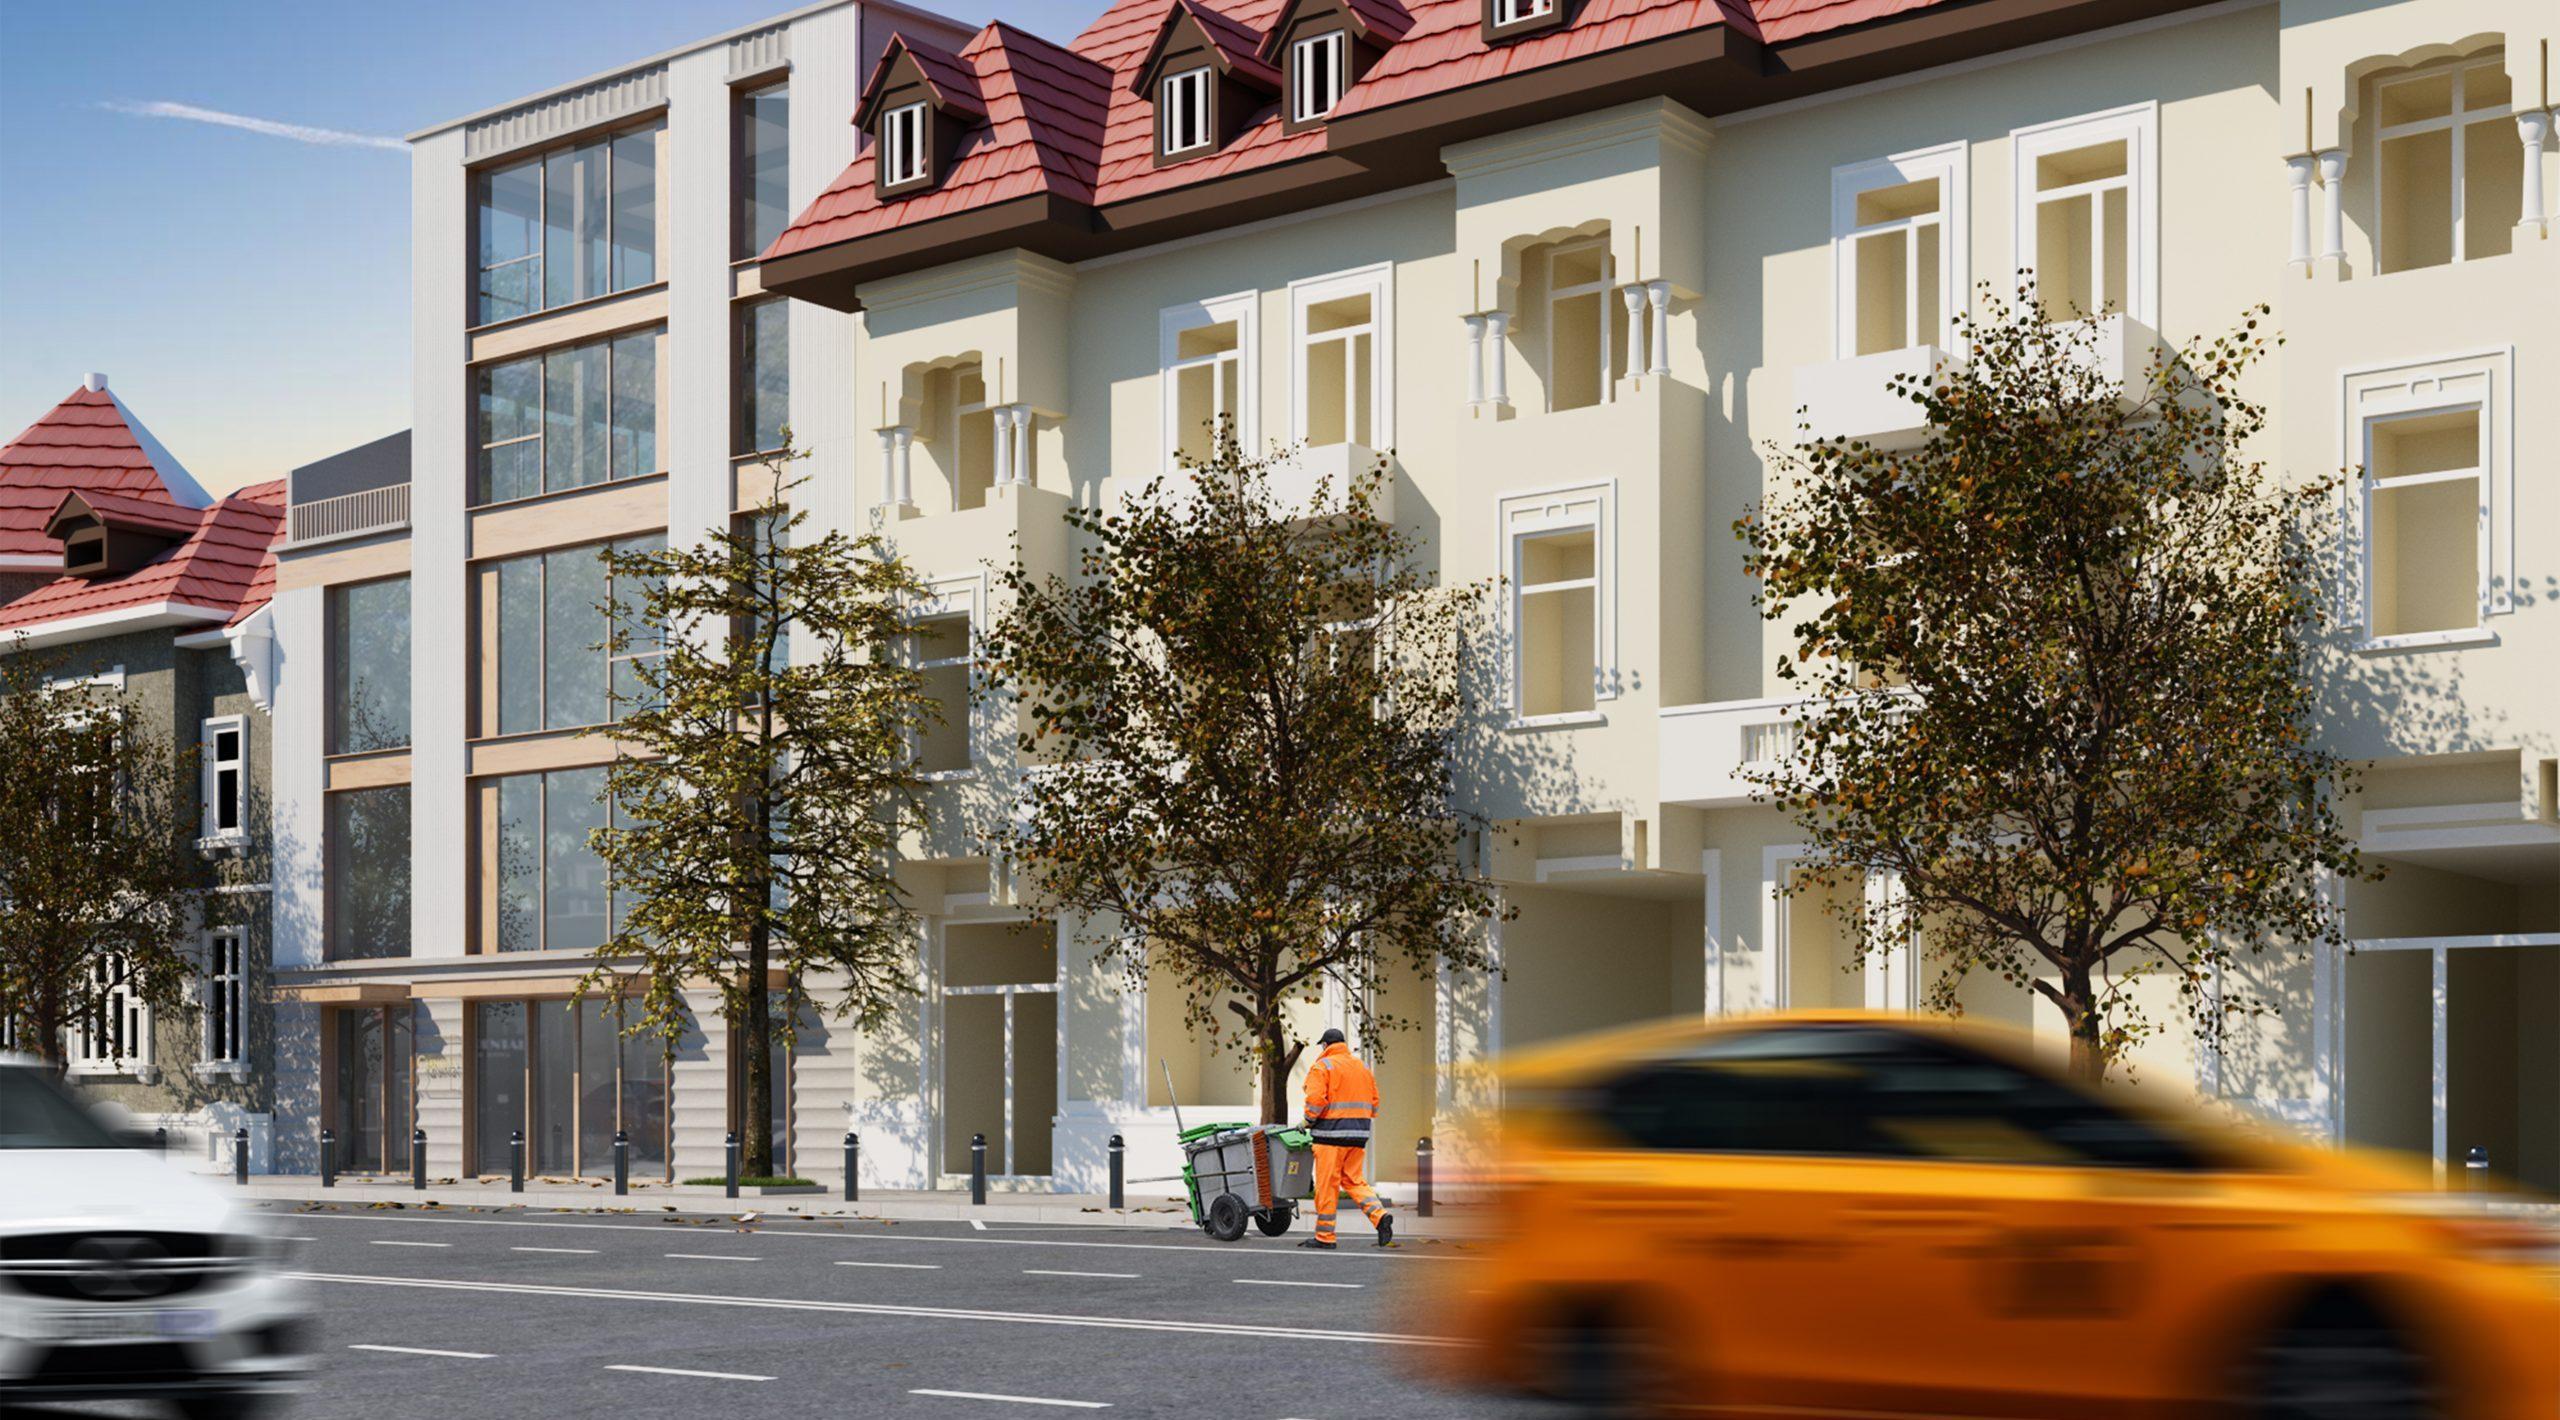 https://nbc-arhitect.ro/wp-content/uploads/2020/11/NBC-Arhitect-_-public-buildings-_-Top-Line-Dorobanti-_-Bucharest-Romania_2-scaled-e1604925379960.jpg